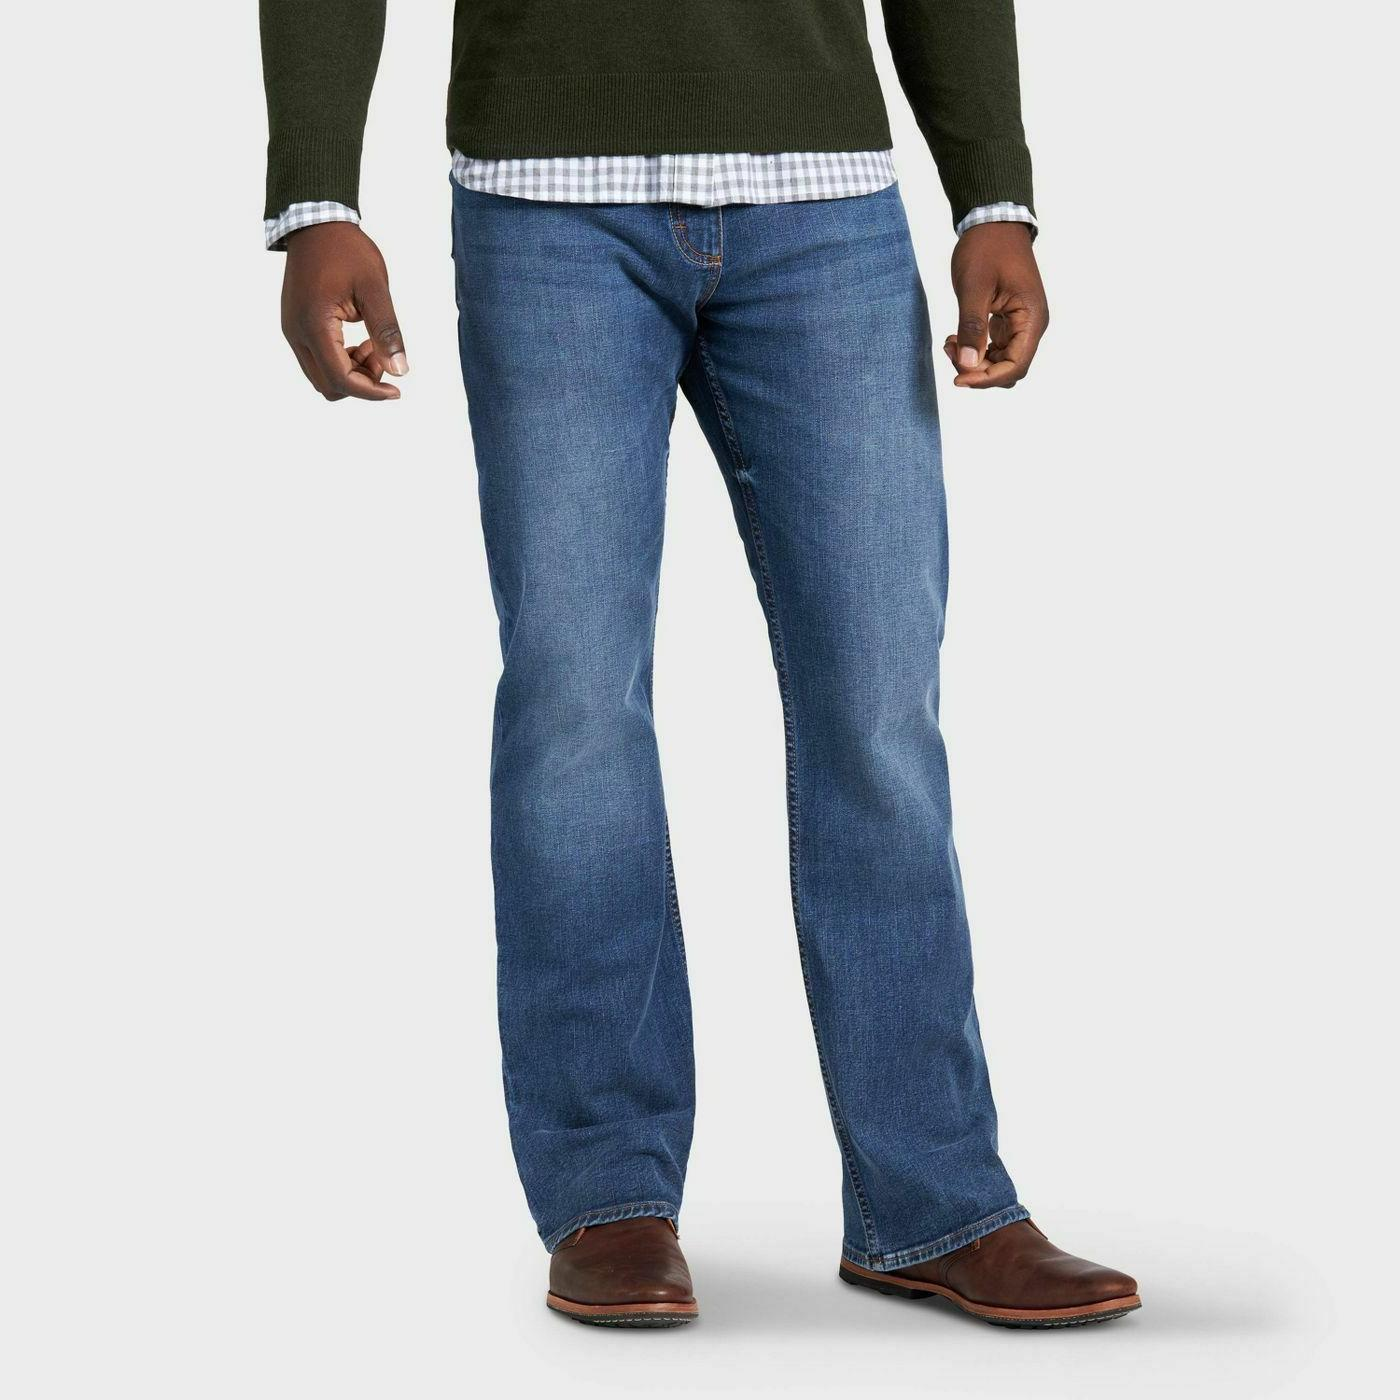 Wrangler Men's Relaxed Bootcut Jeans Blue Work Casual Denim